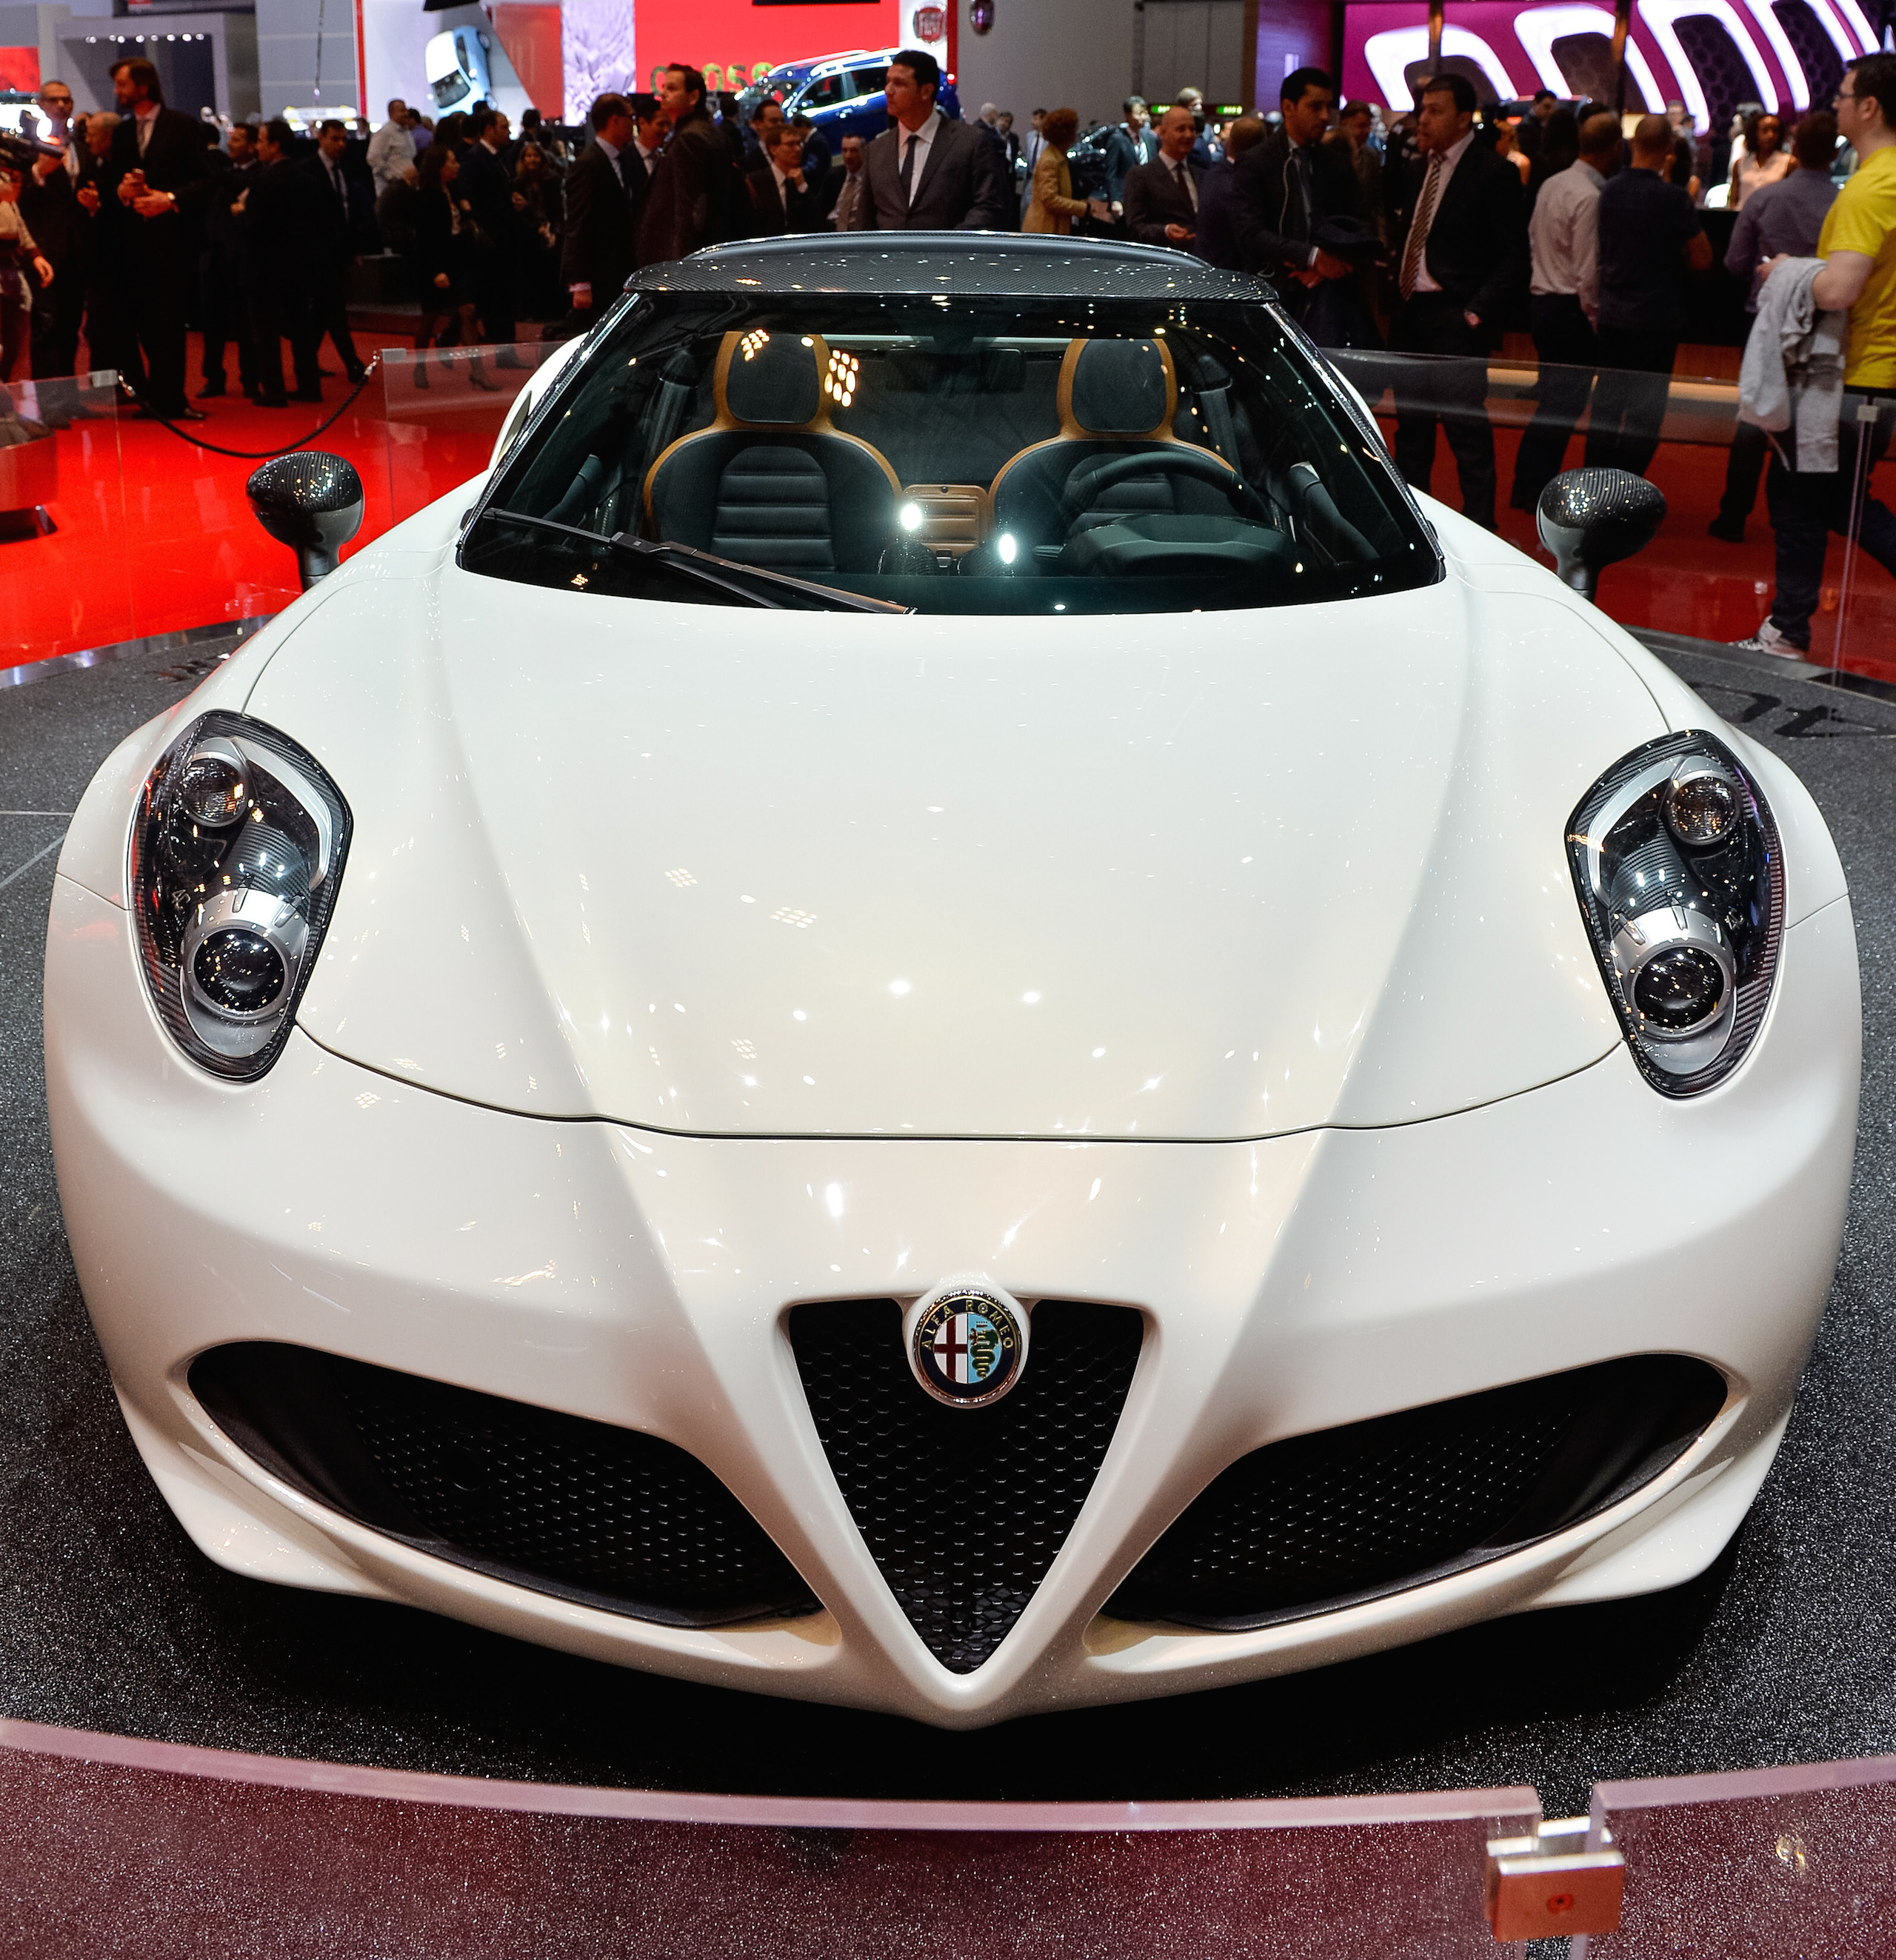 Alfa Romeo 4C Spider Concept Previews 2015 Model Image 234015